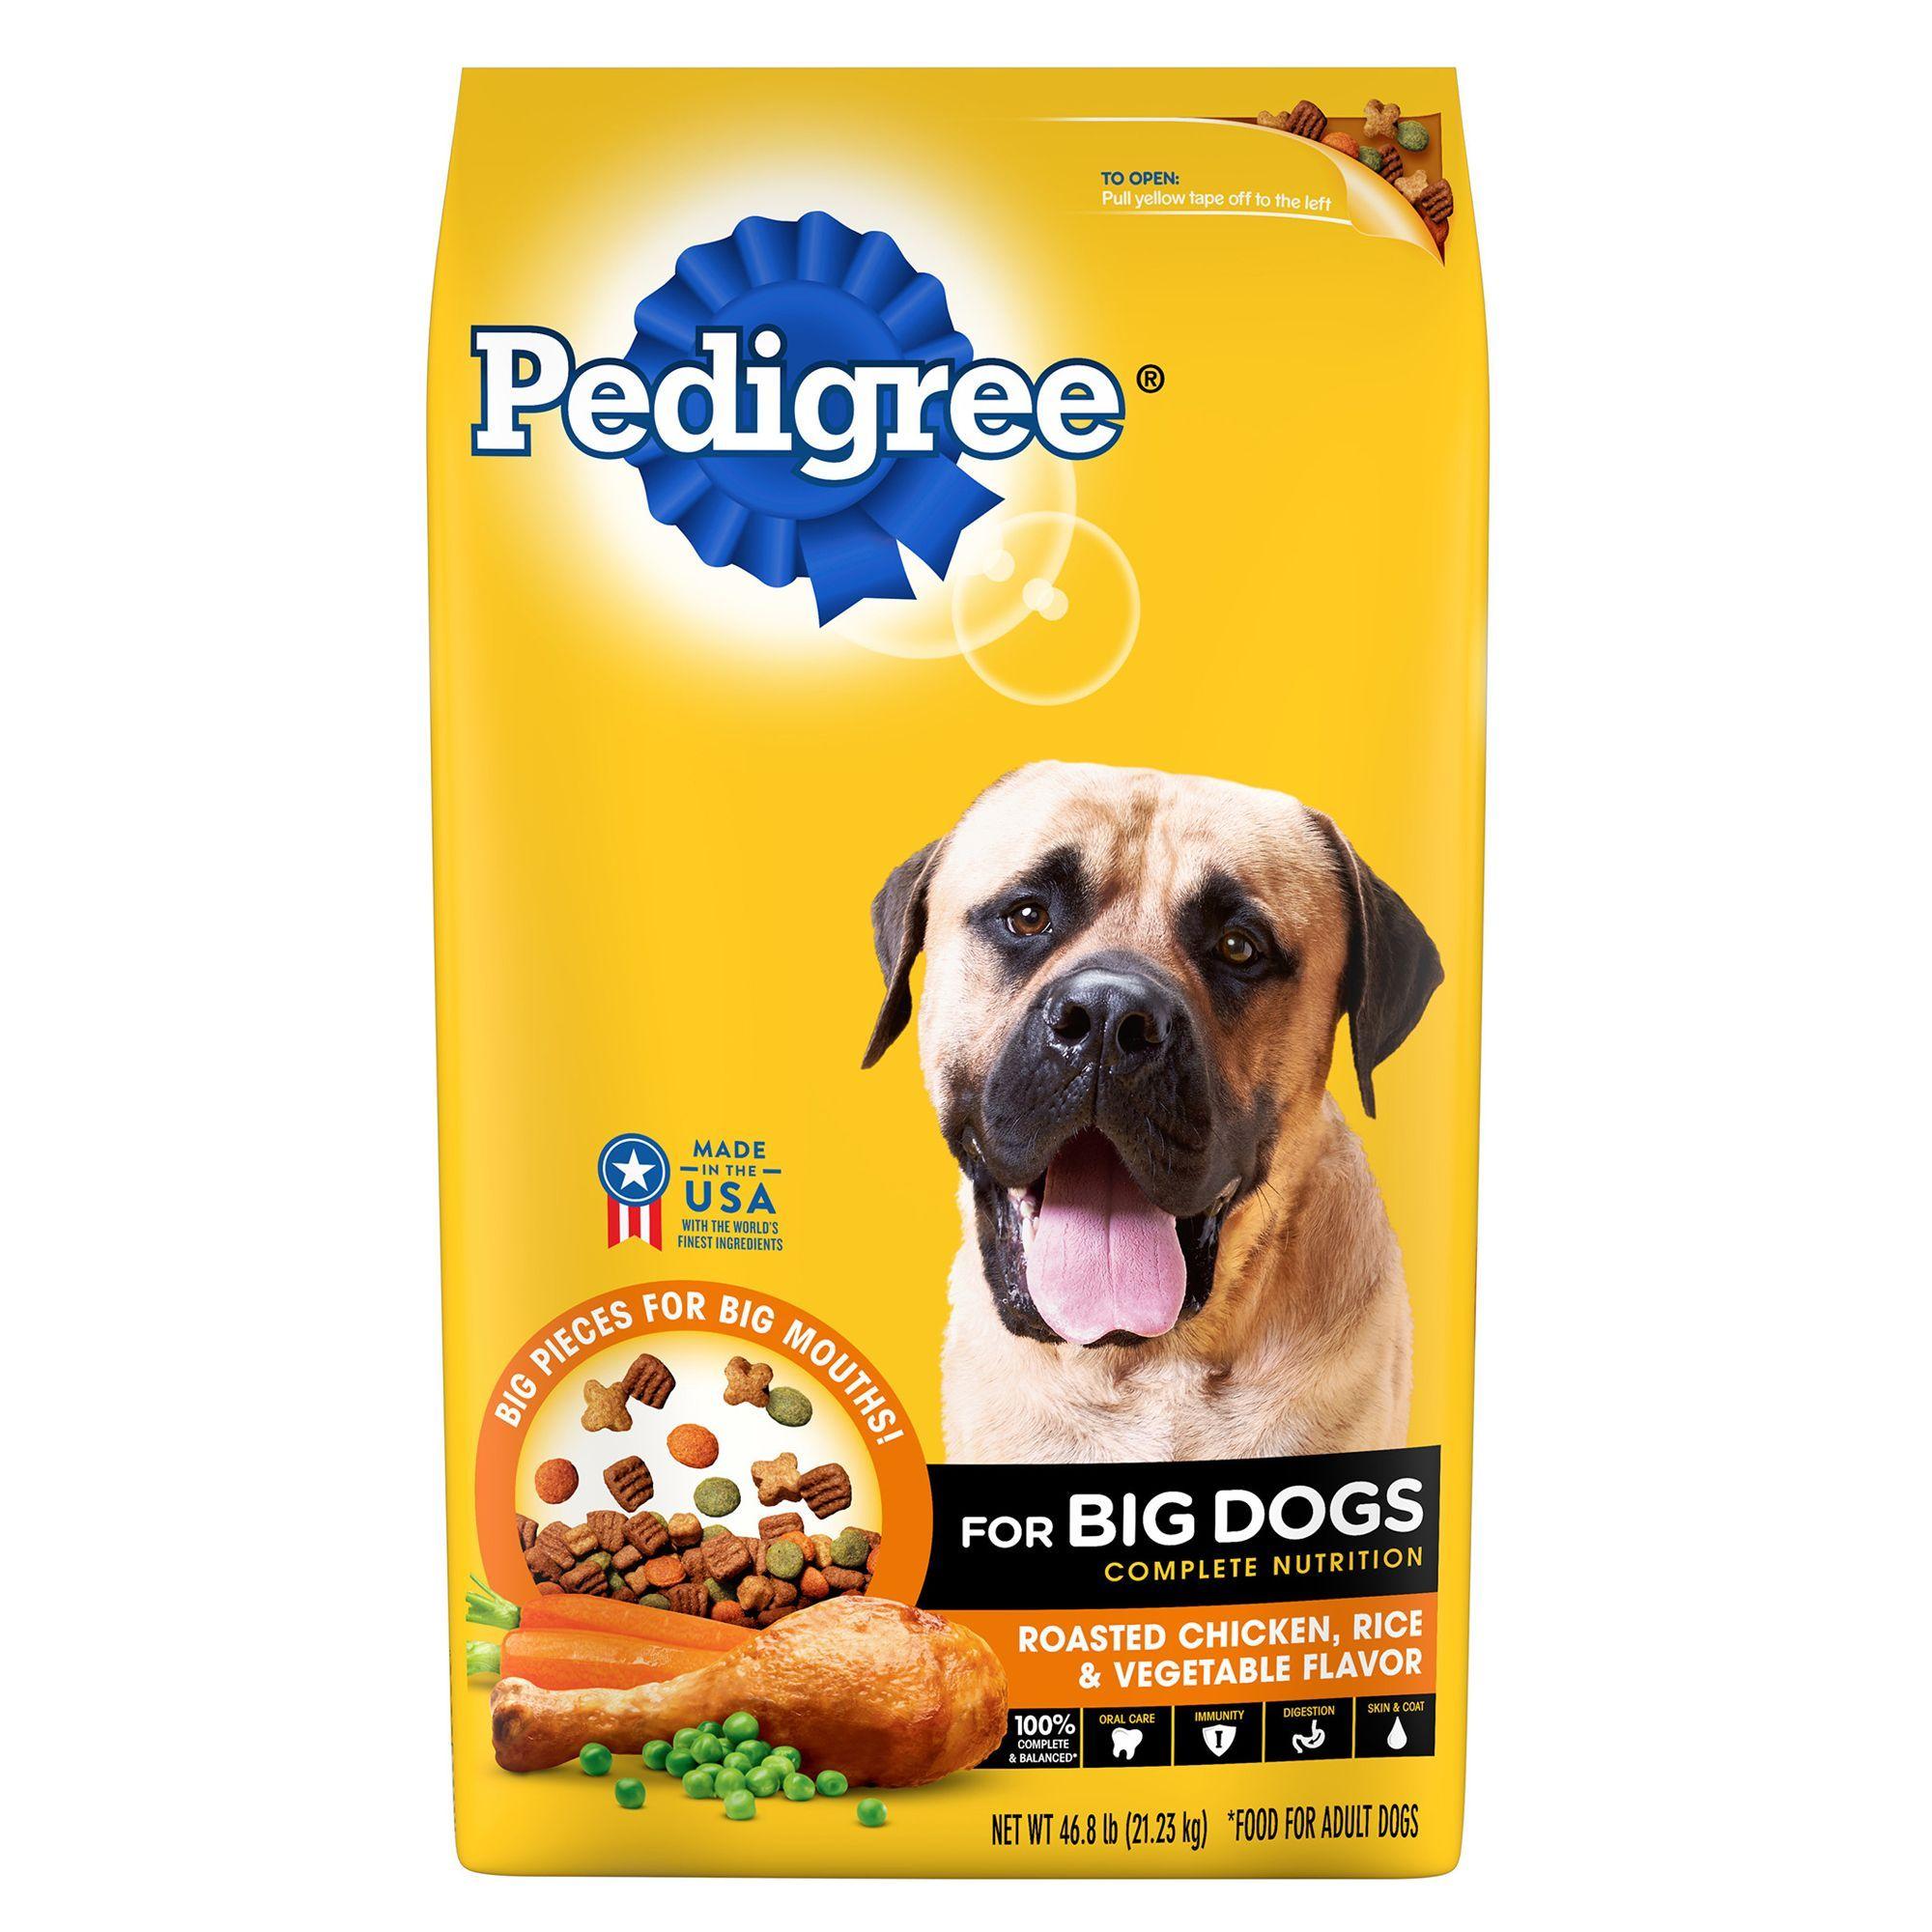 Pedigree For Big Dogs Dog Food Size 46 8 Lb Beet Blue Bone